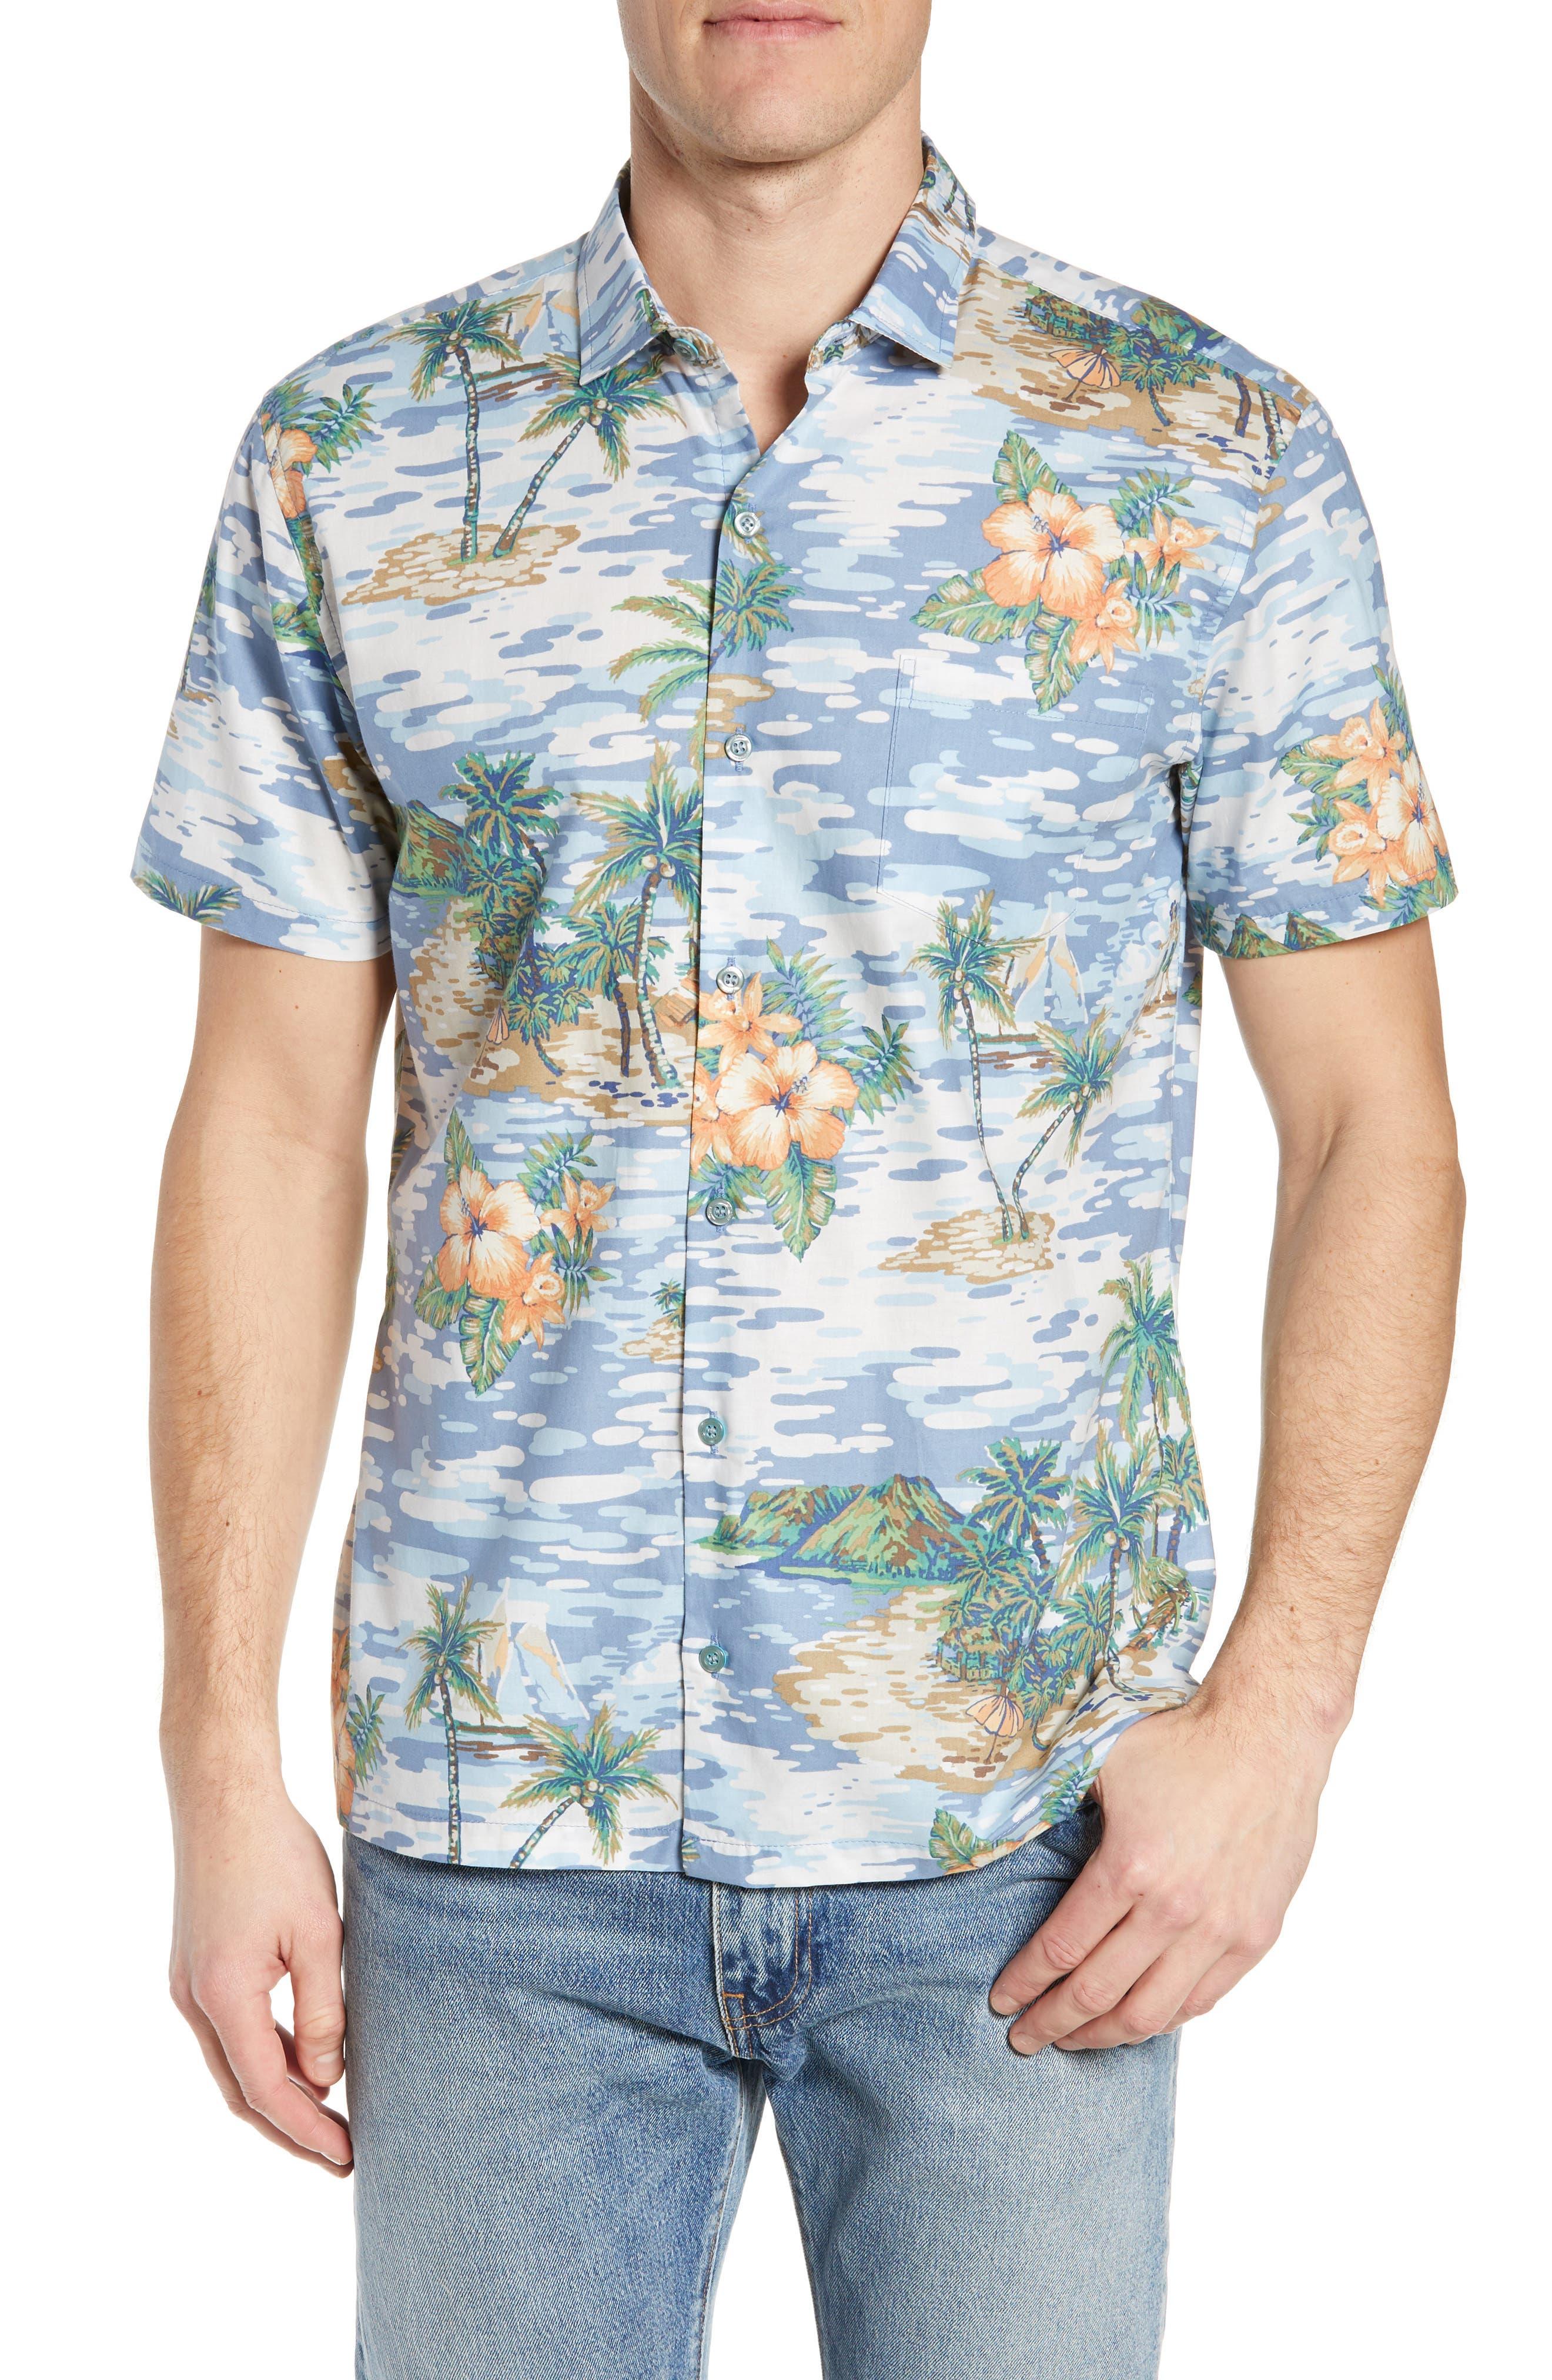 TORI RICHARD Archipelago Regular Fit Sport Shirt, Main, color, 061